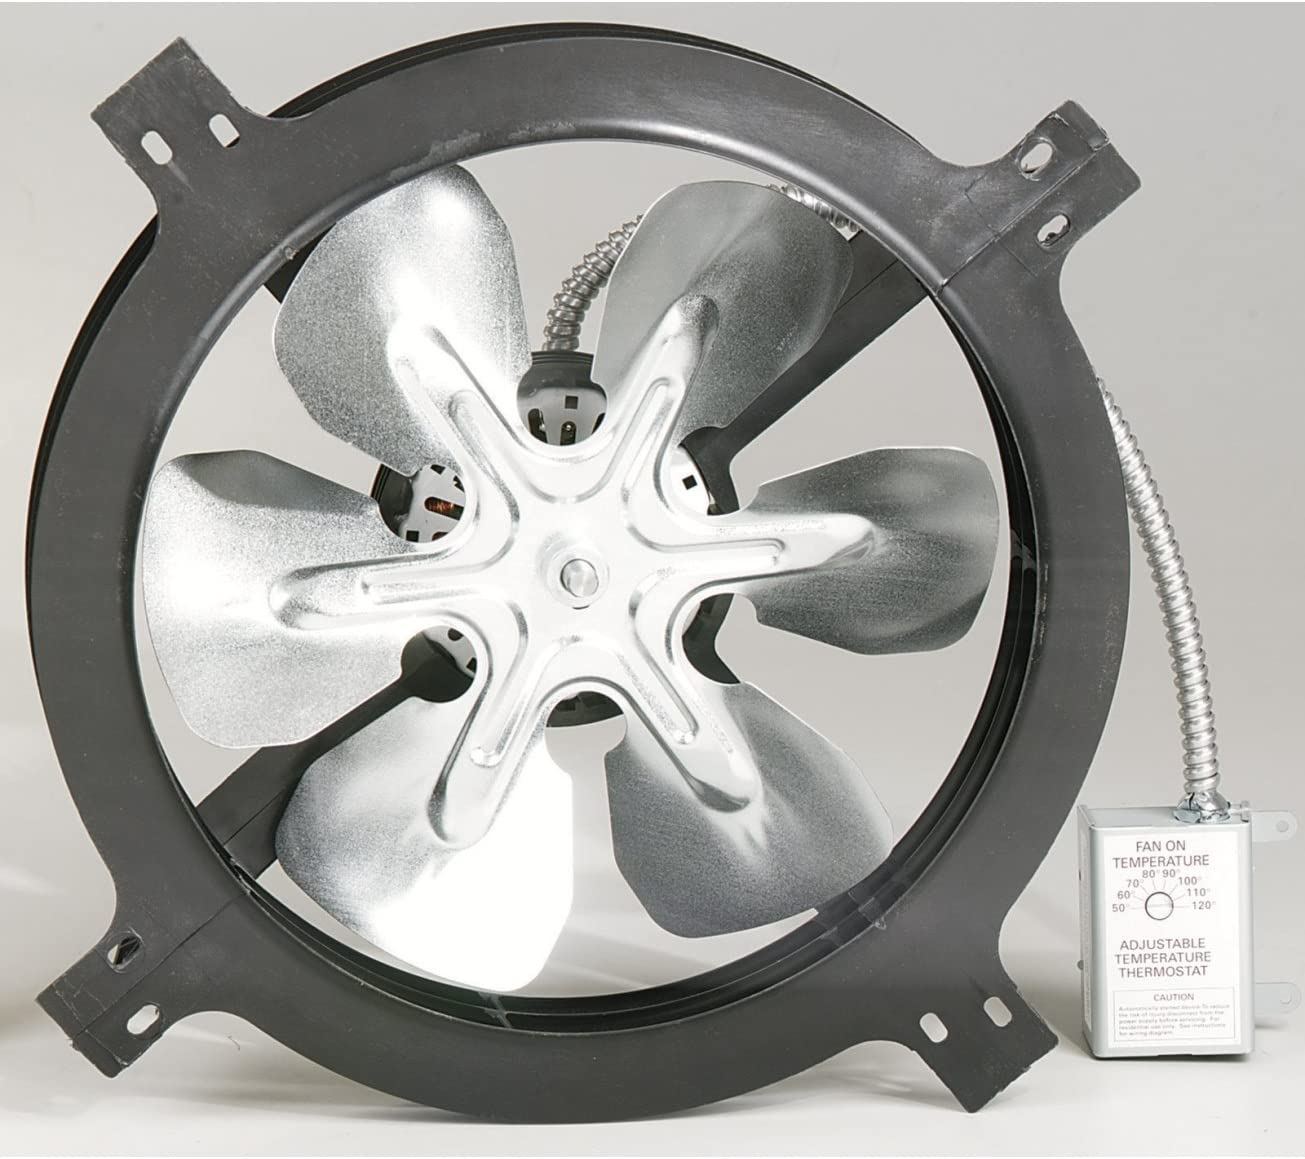 Air Vent Gable Ventilator 53315 Attic And Whole House Fans Multicolor Medium Amazon Com